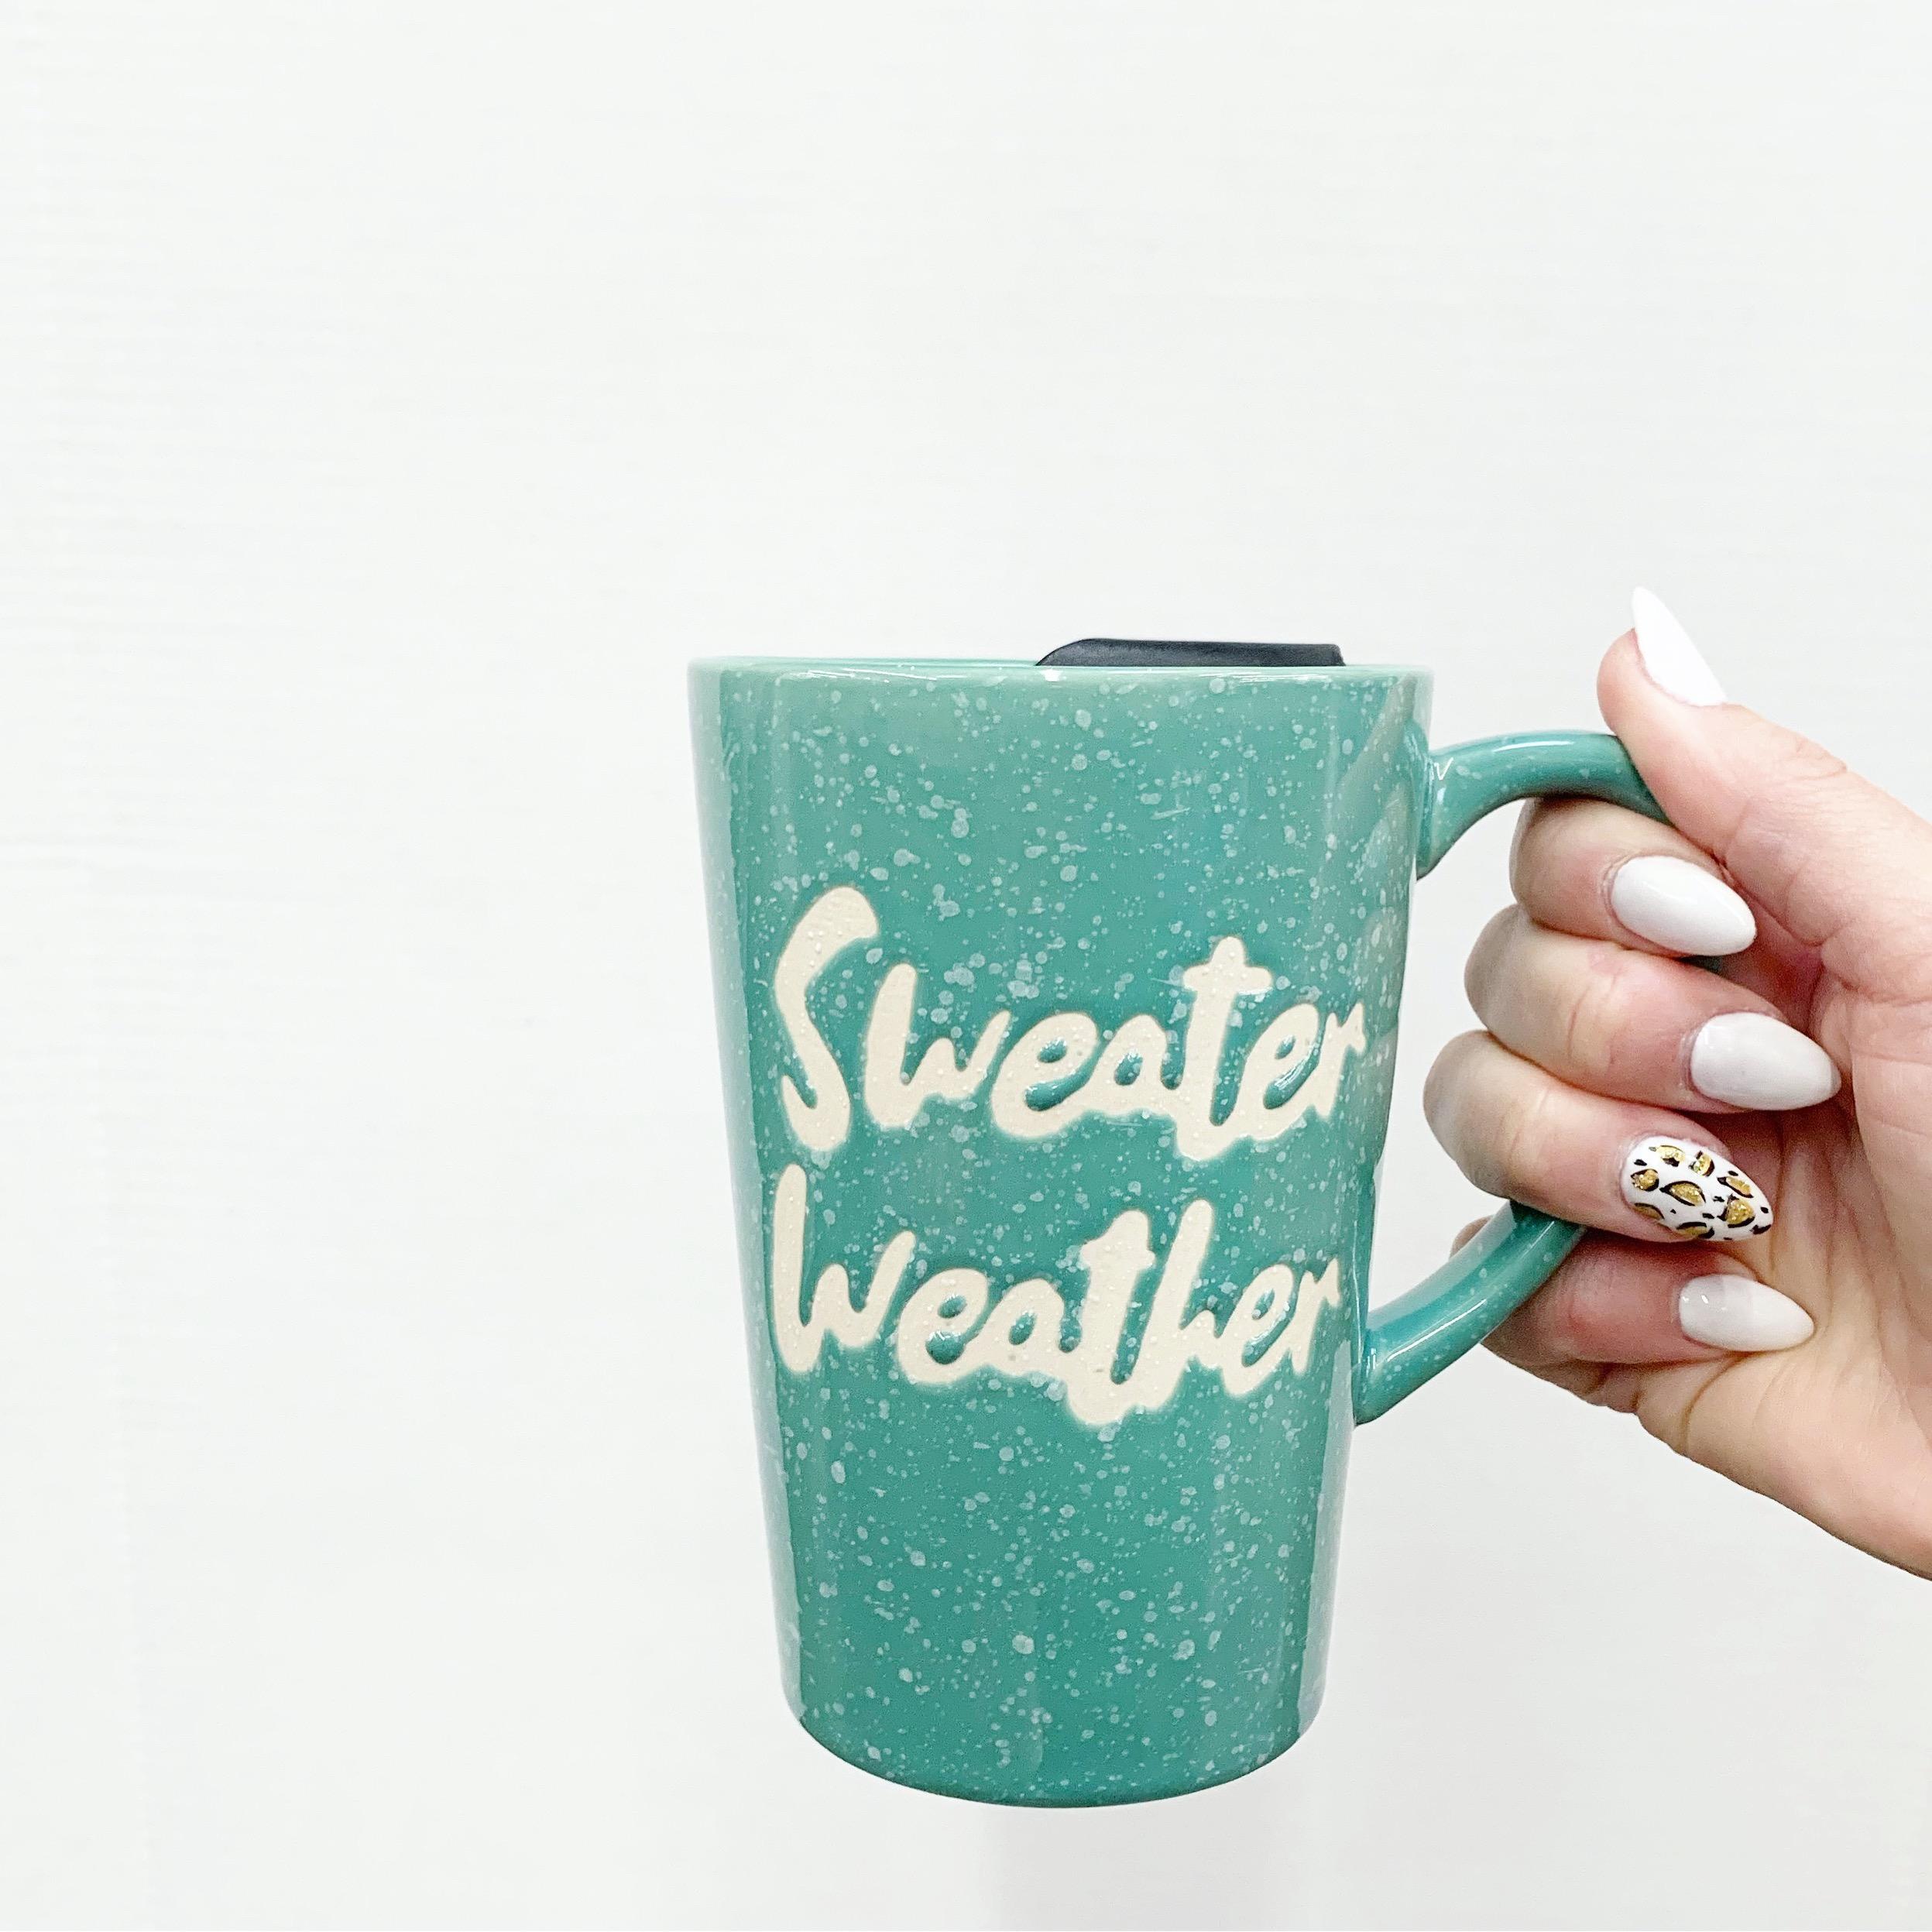 green coffee mug that says sweater weather